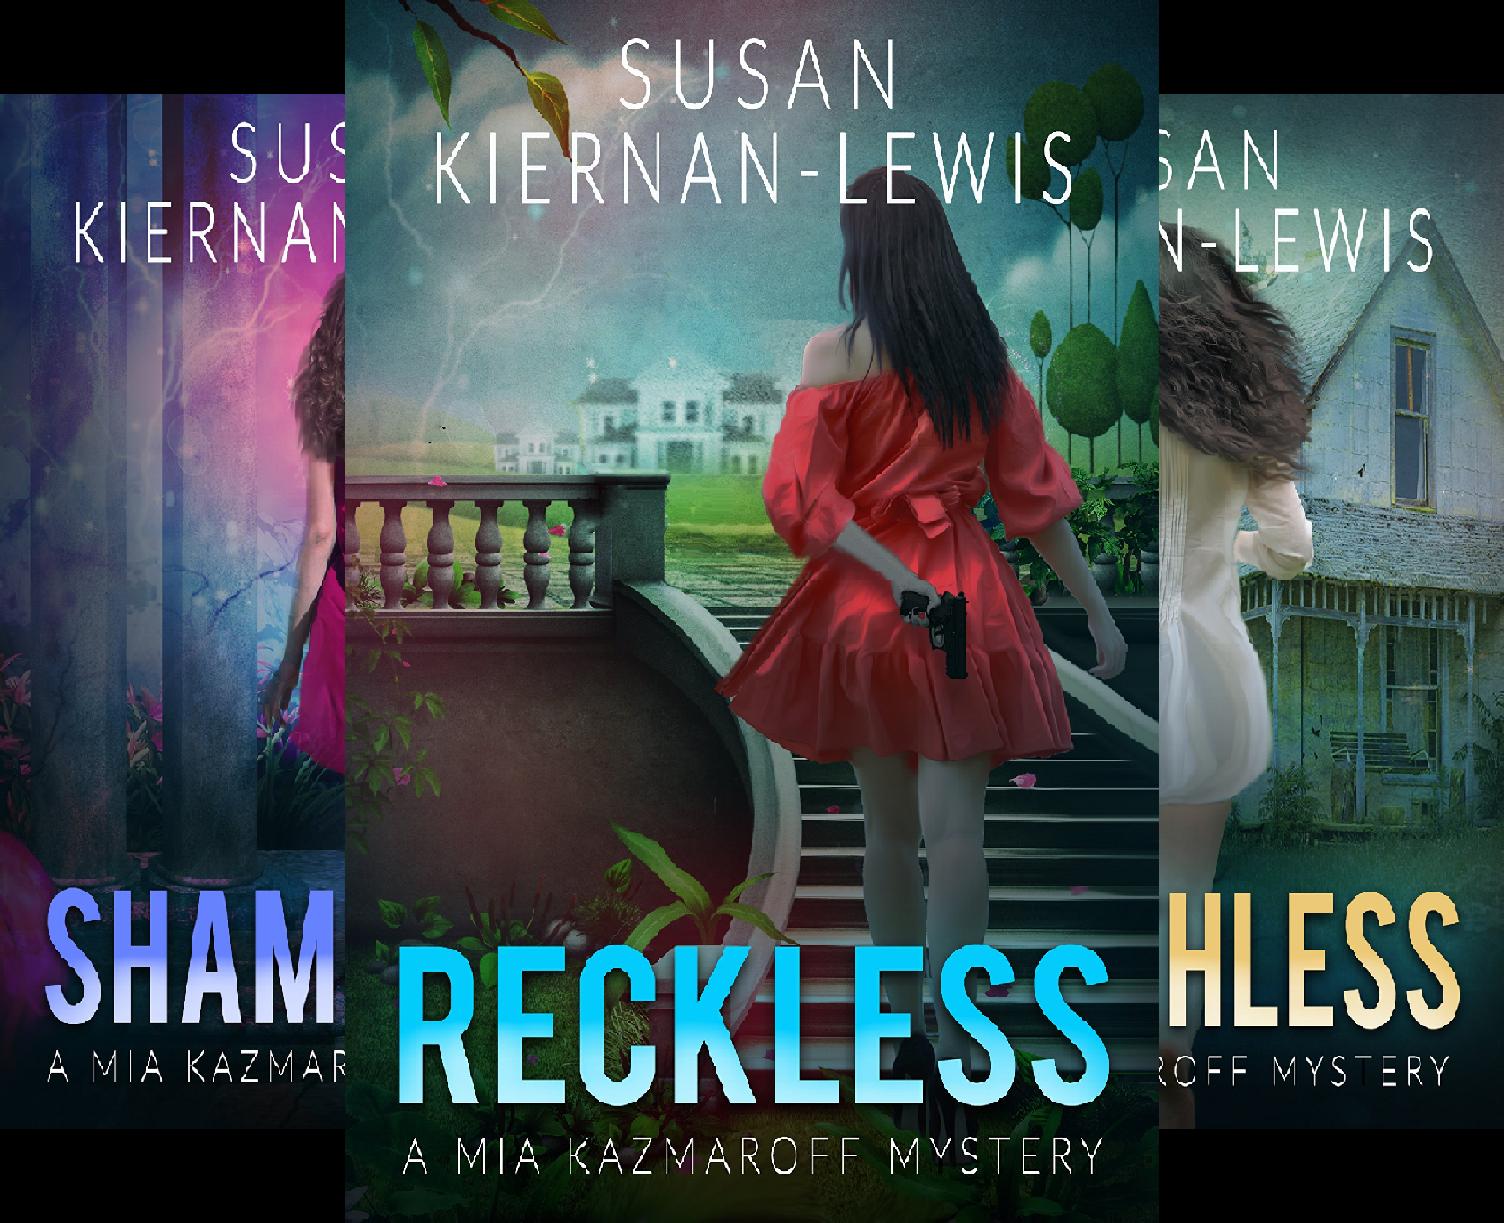 Mia Kazmaroff Mystery Series (6 Book Series)